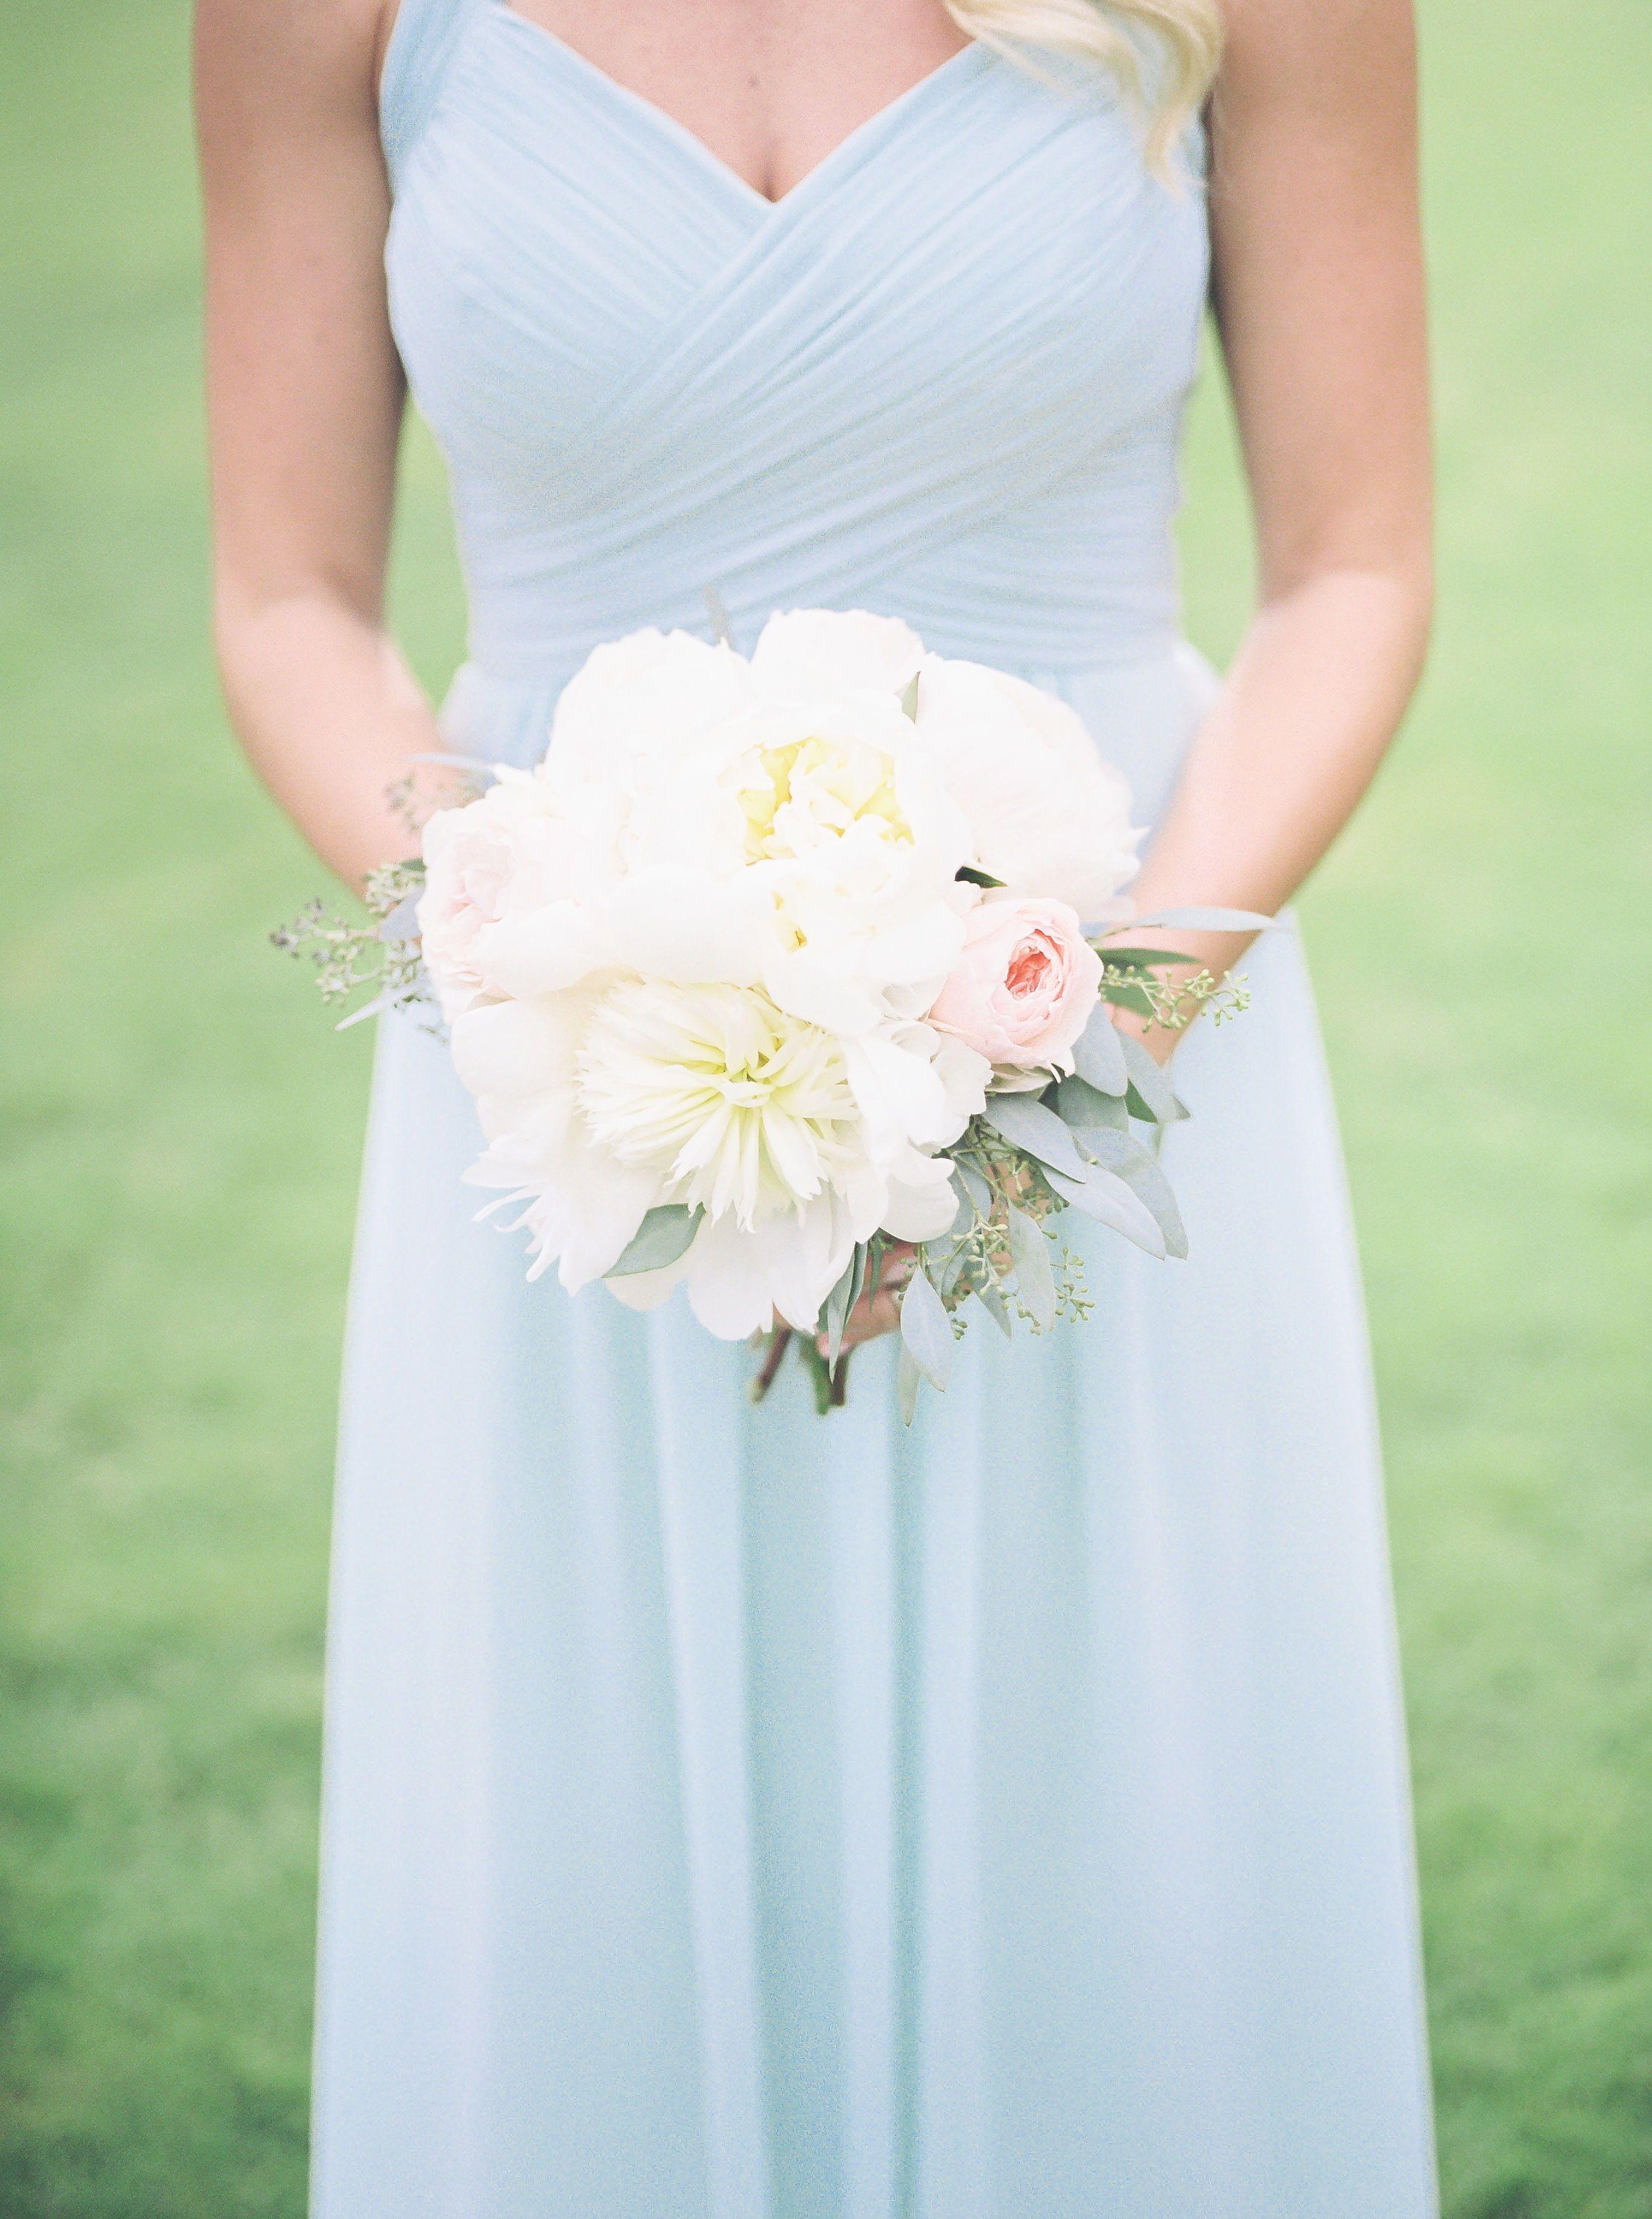 Light blue bridesmaid dress with white wedding bouquet nc wedding